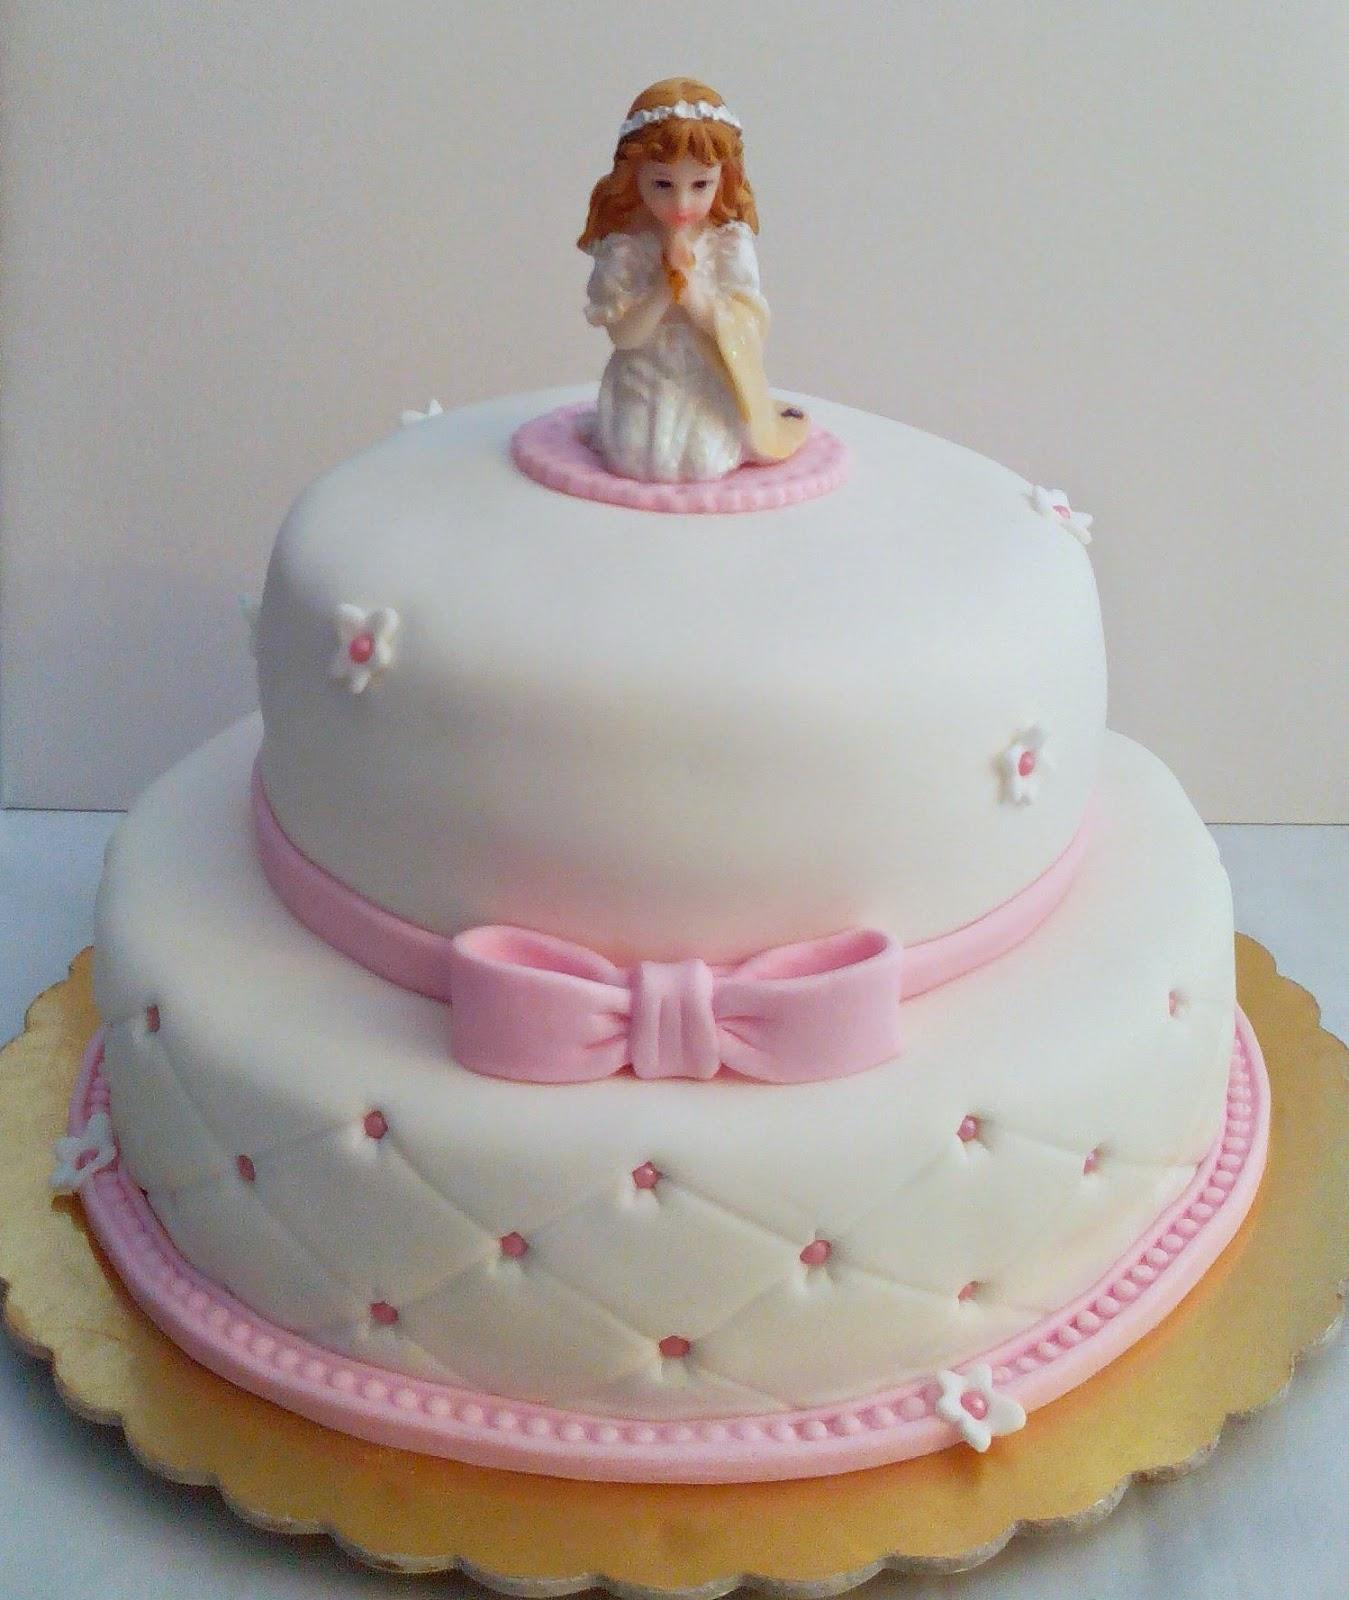 Cake Decorating Company Massa : Bolos da Luiza: Batizado e Comunhao